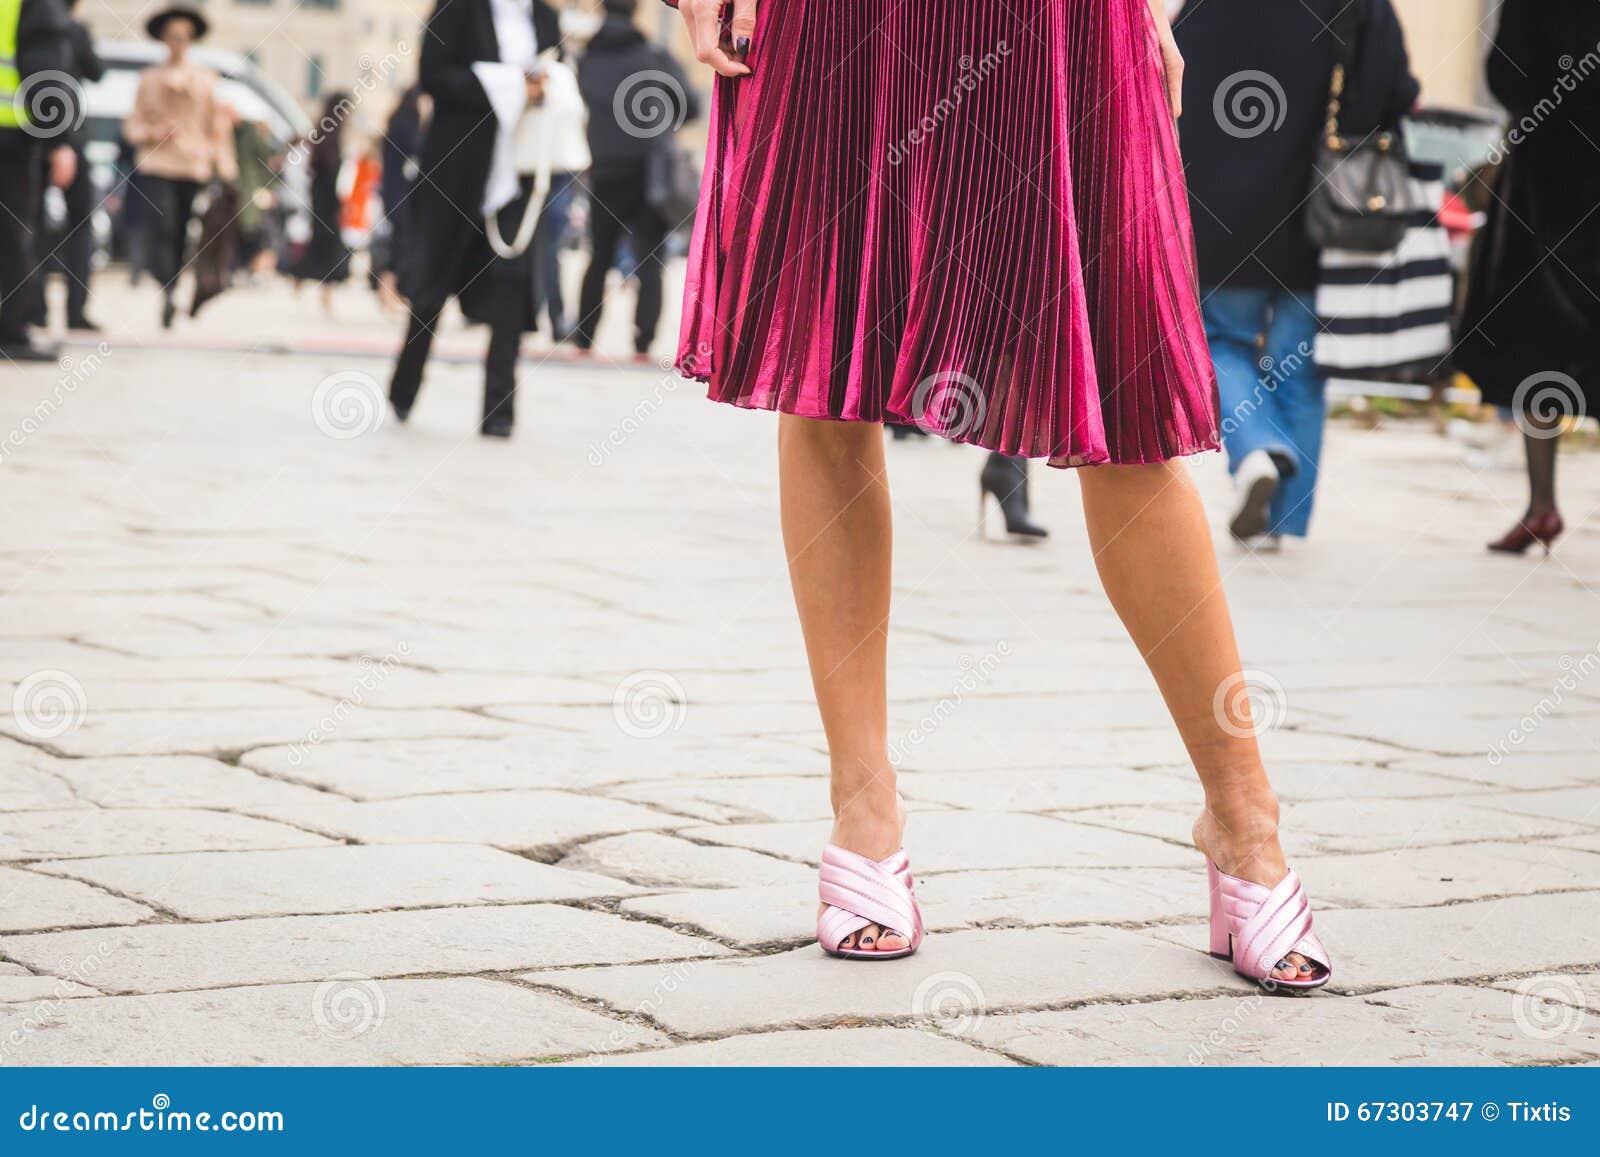 7ae4f91b630c Λεπτομέρεια των παπουτσιών έξω από το κτήριο επιδείξεων μόδας της ...